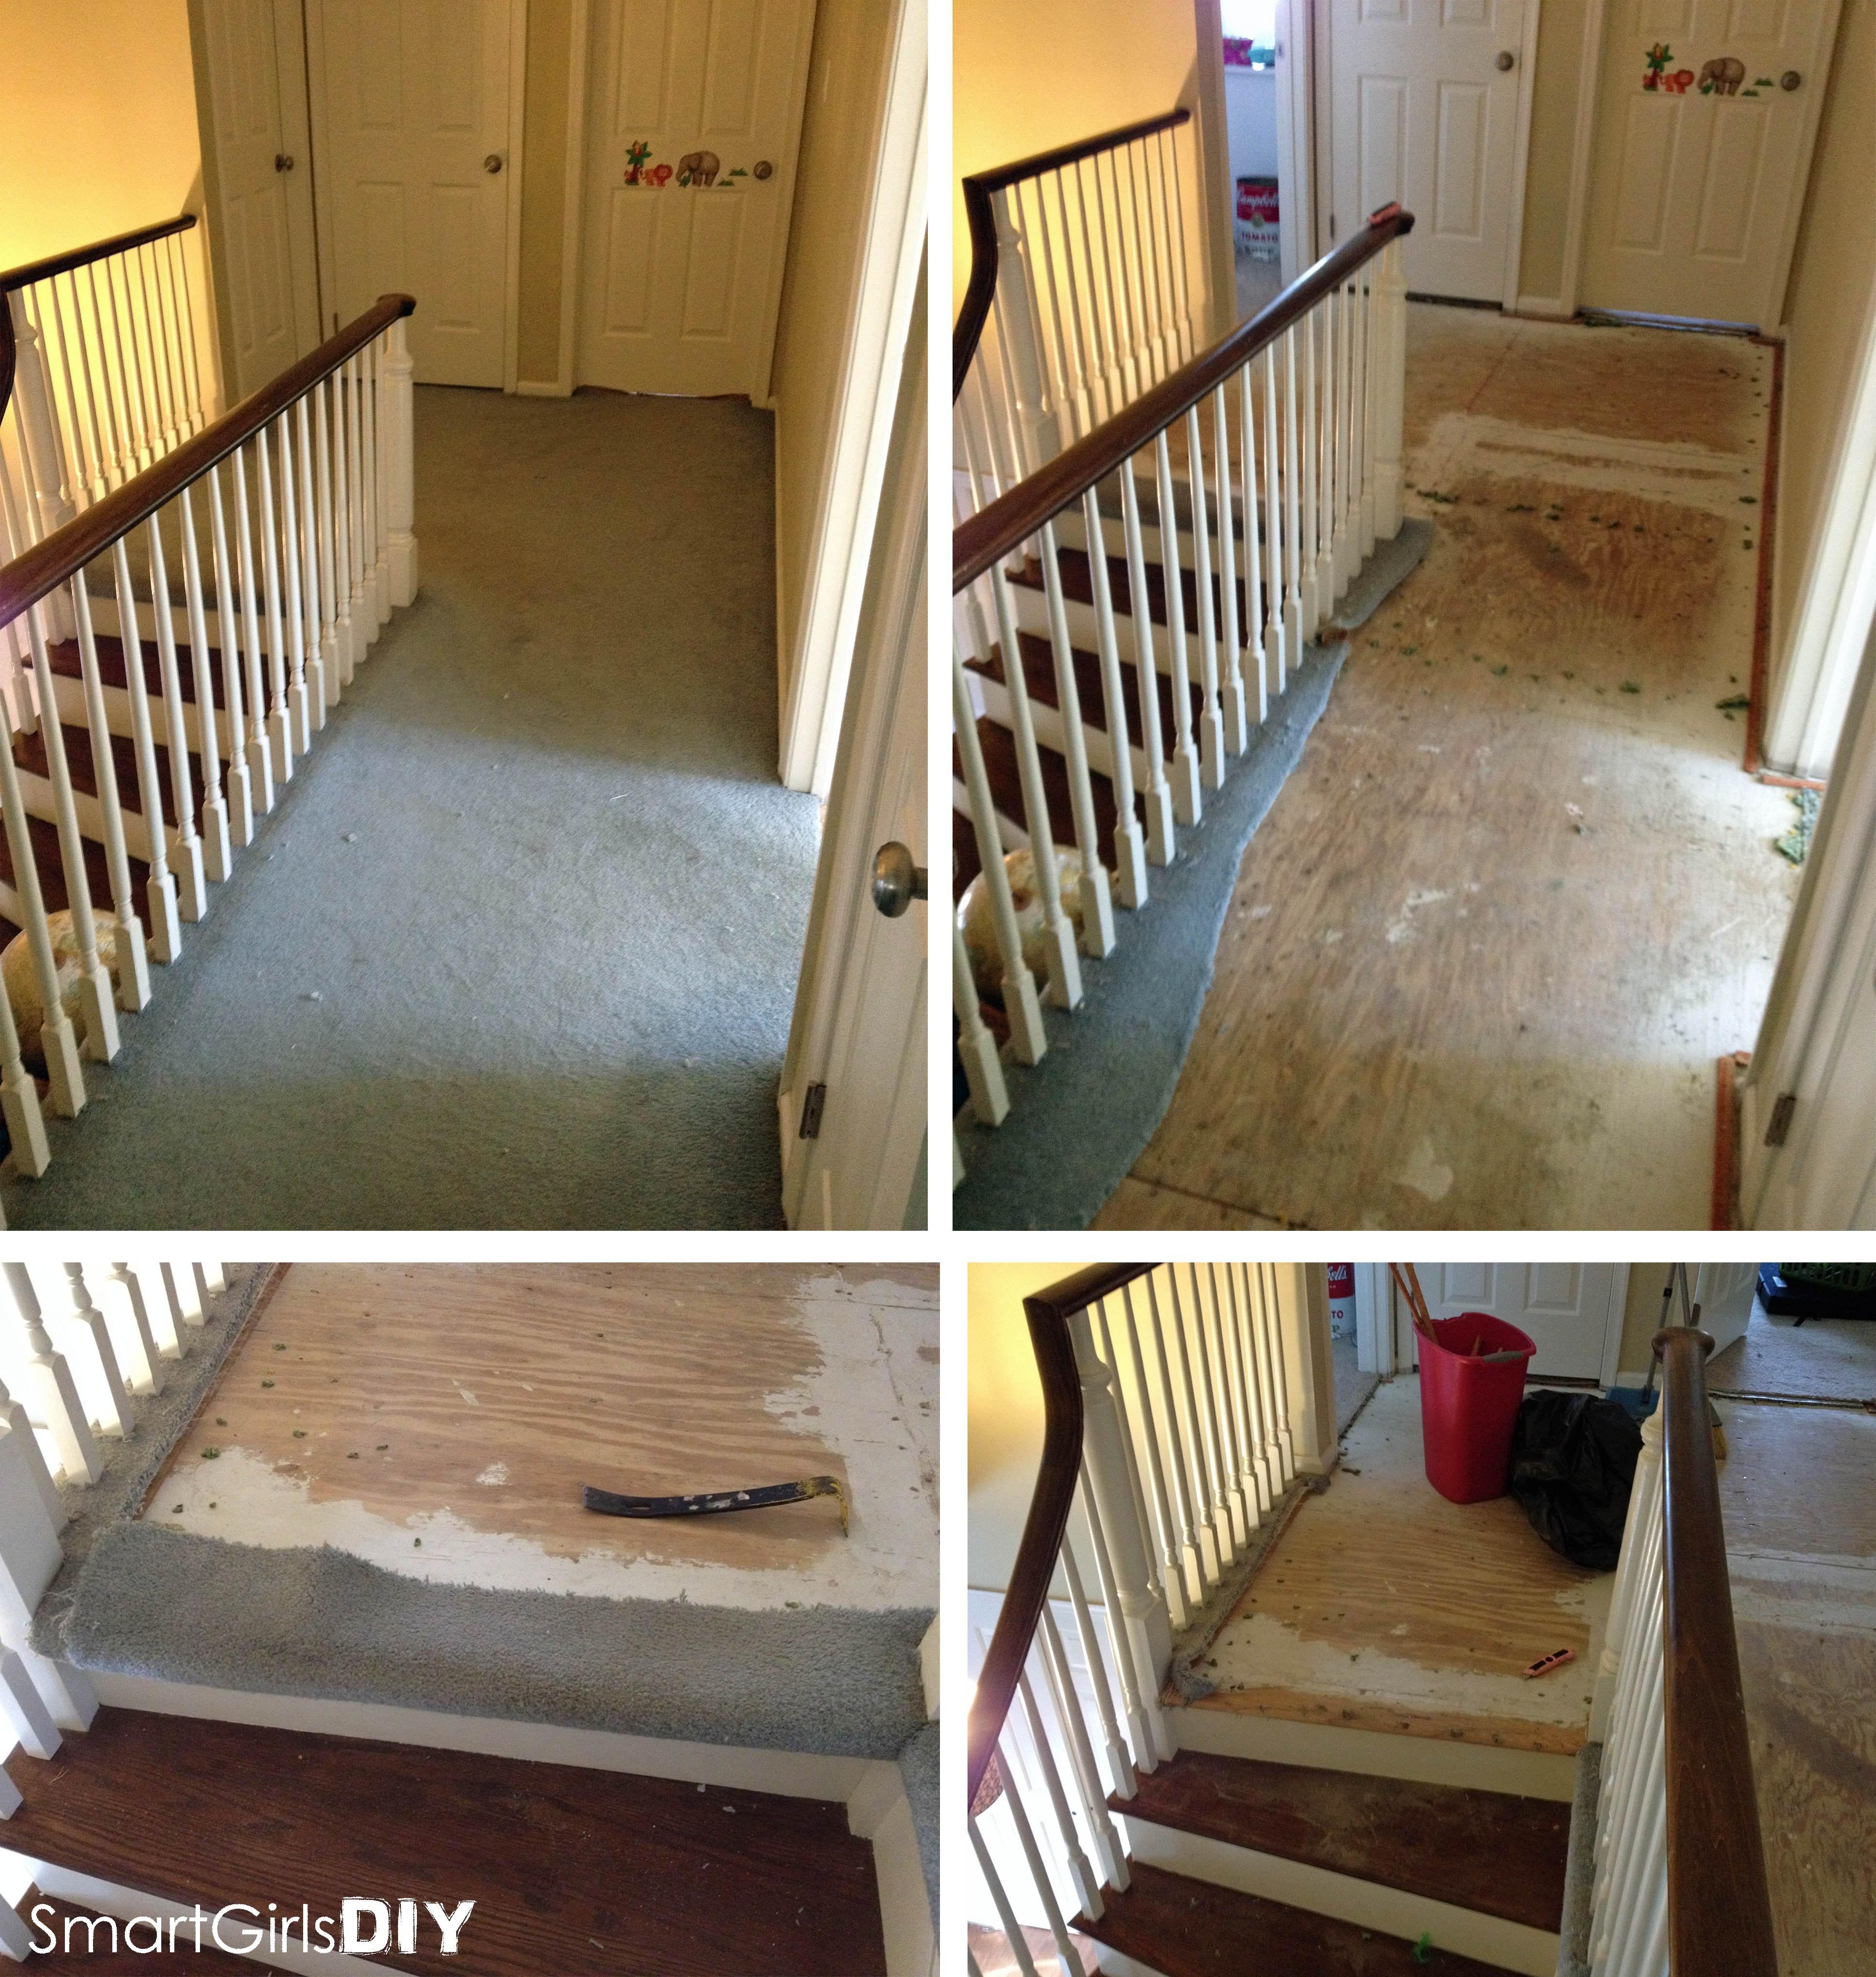 master bedroom hardwood floor pictures of upstairs hallway 1 installing hardwood floors intended for removing carpet from hallway installing the hardwood floor